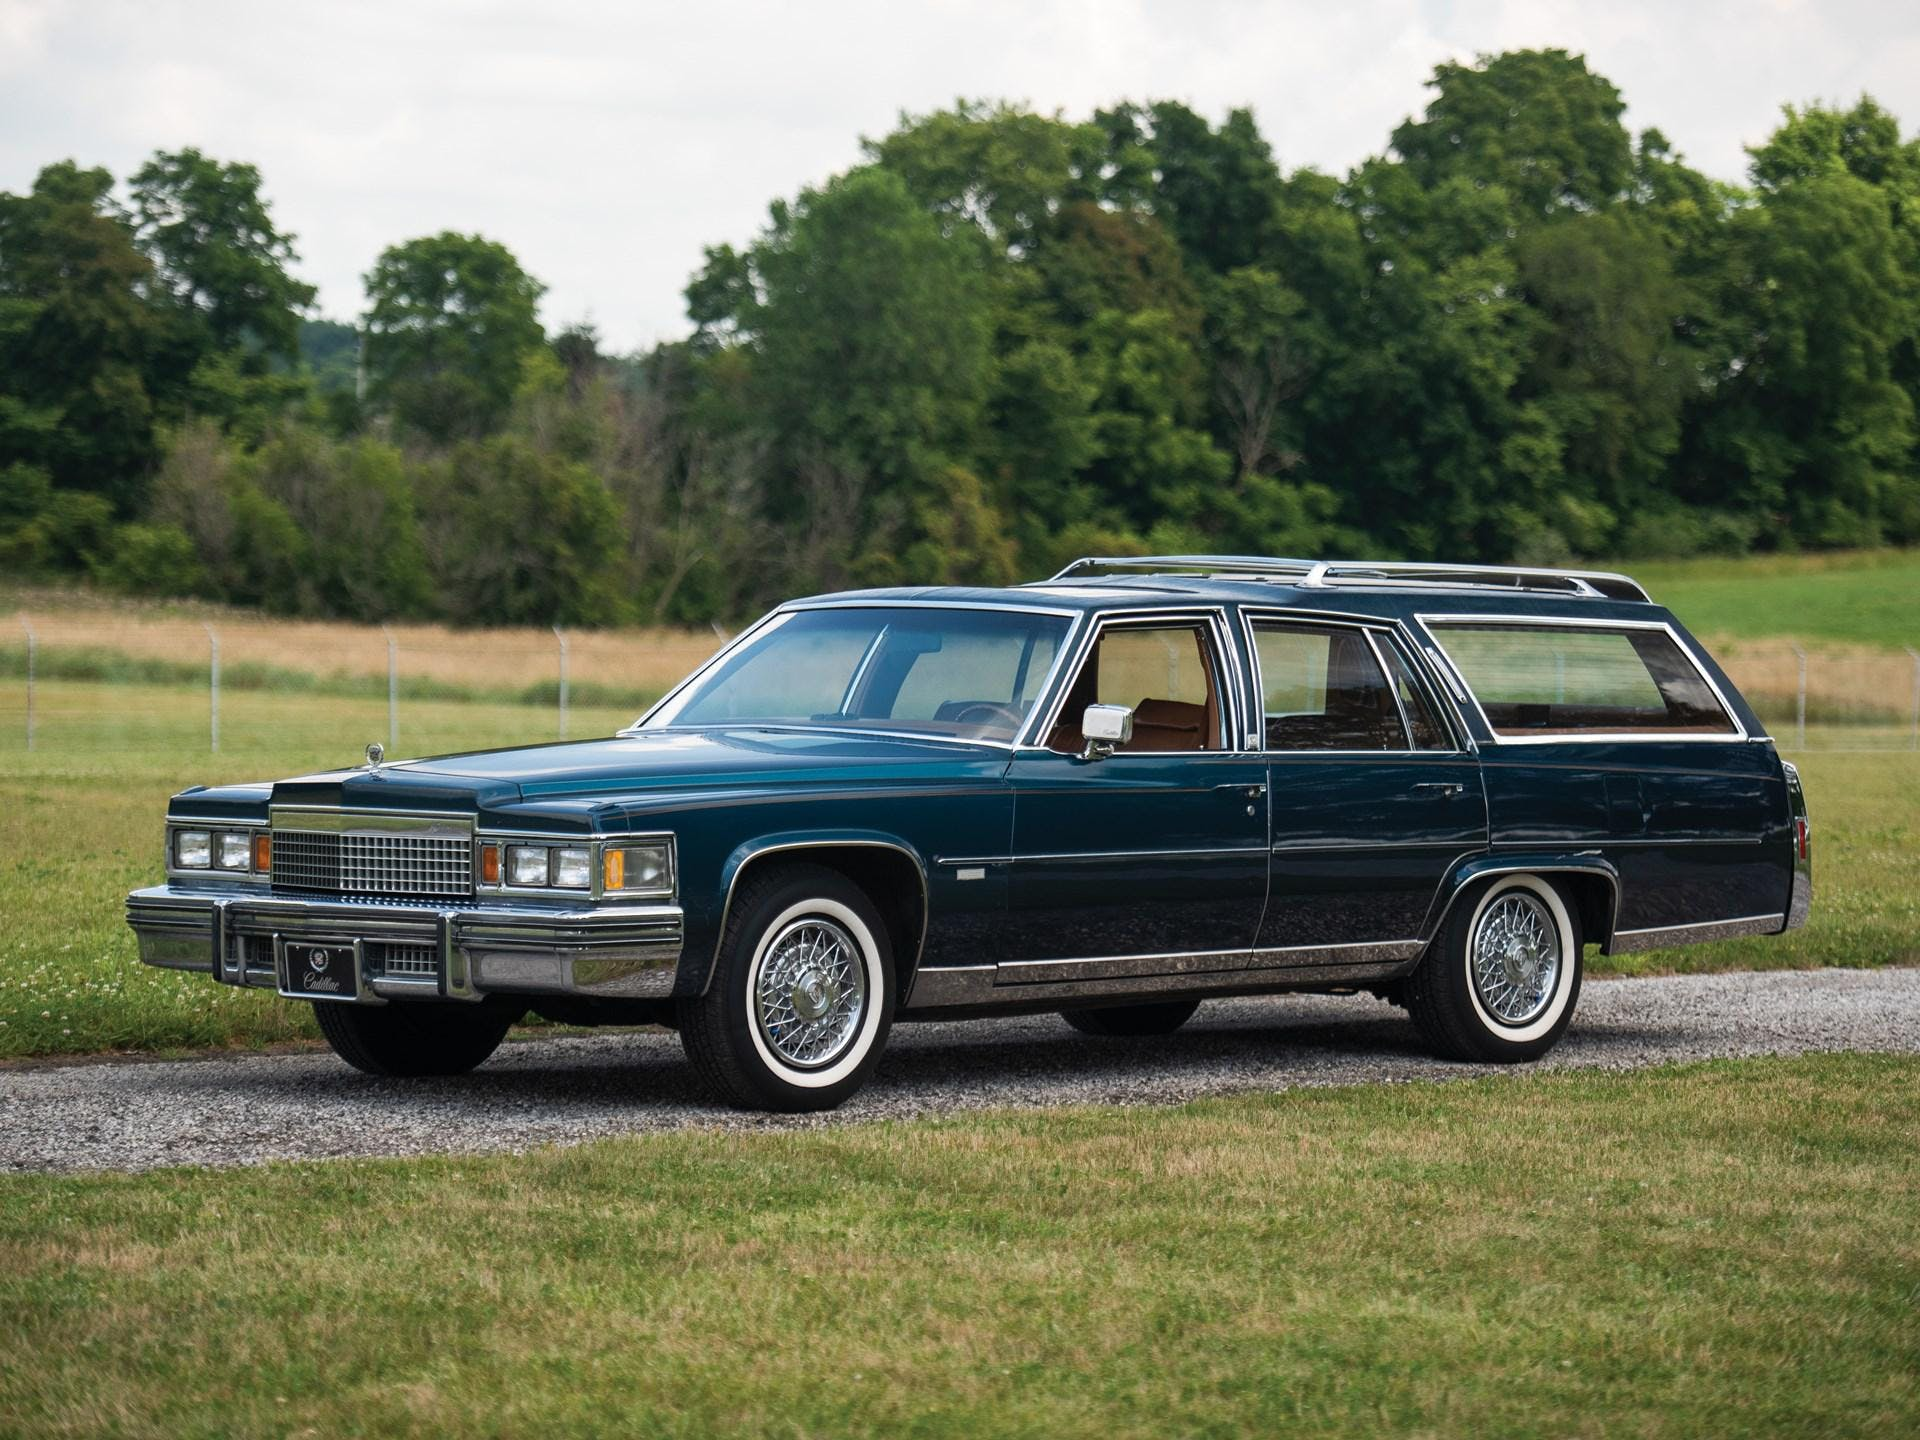 1979 Cadillac Fleetwood Brougham d'Elegance Station Wagon by r.s. Harper Custom Coachbuilders